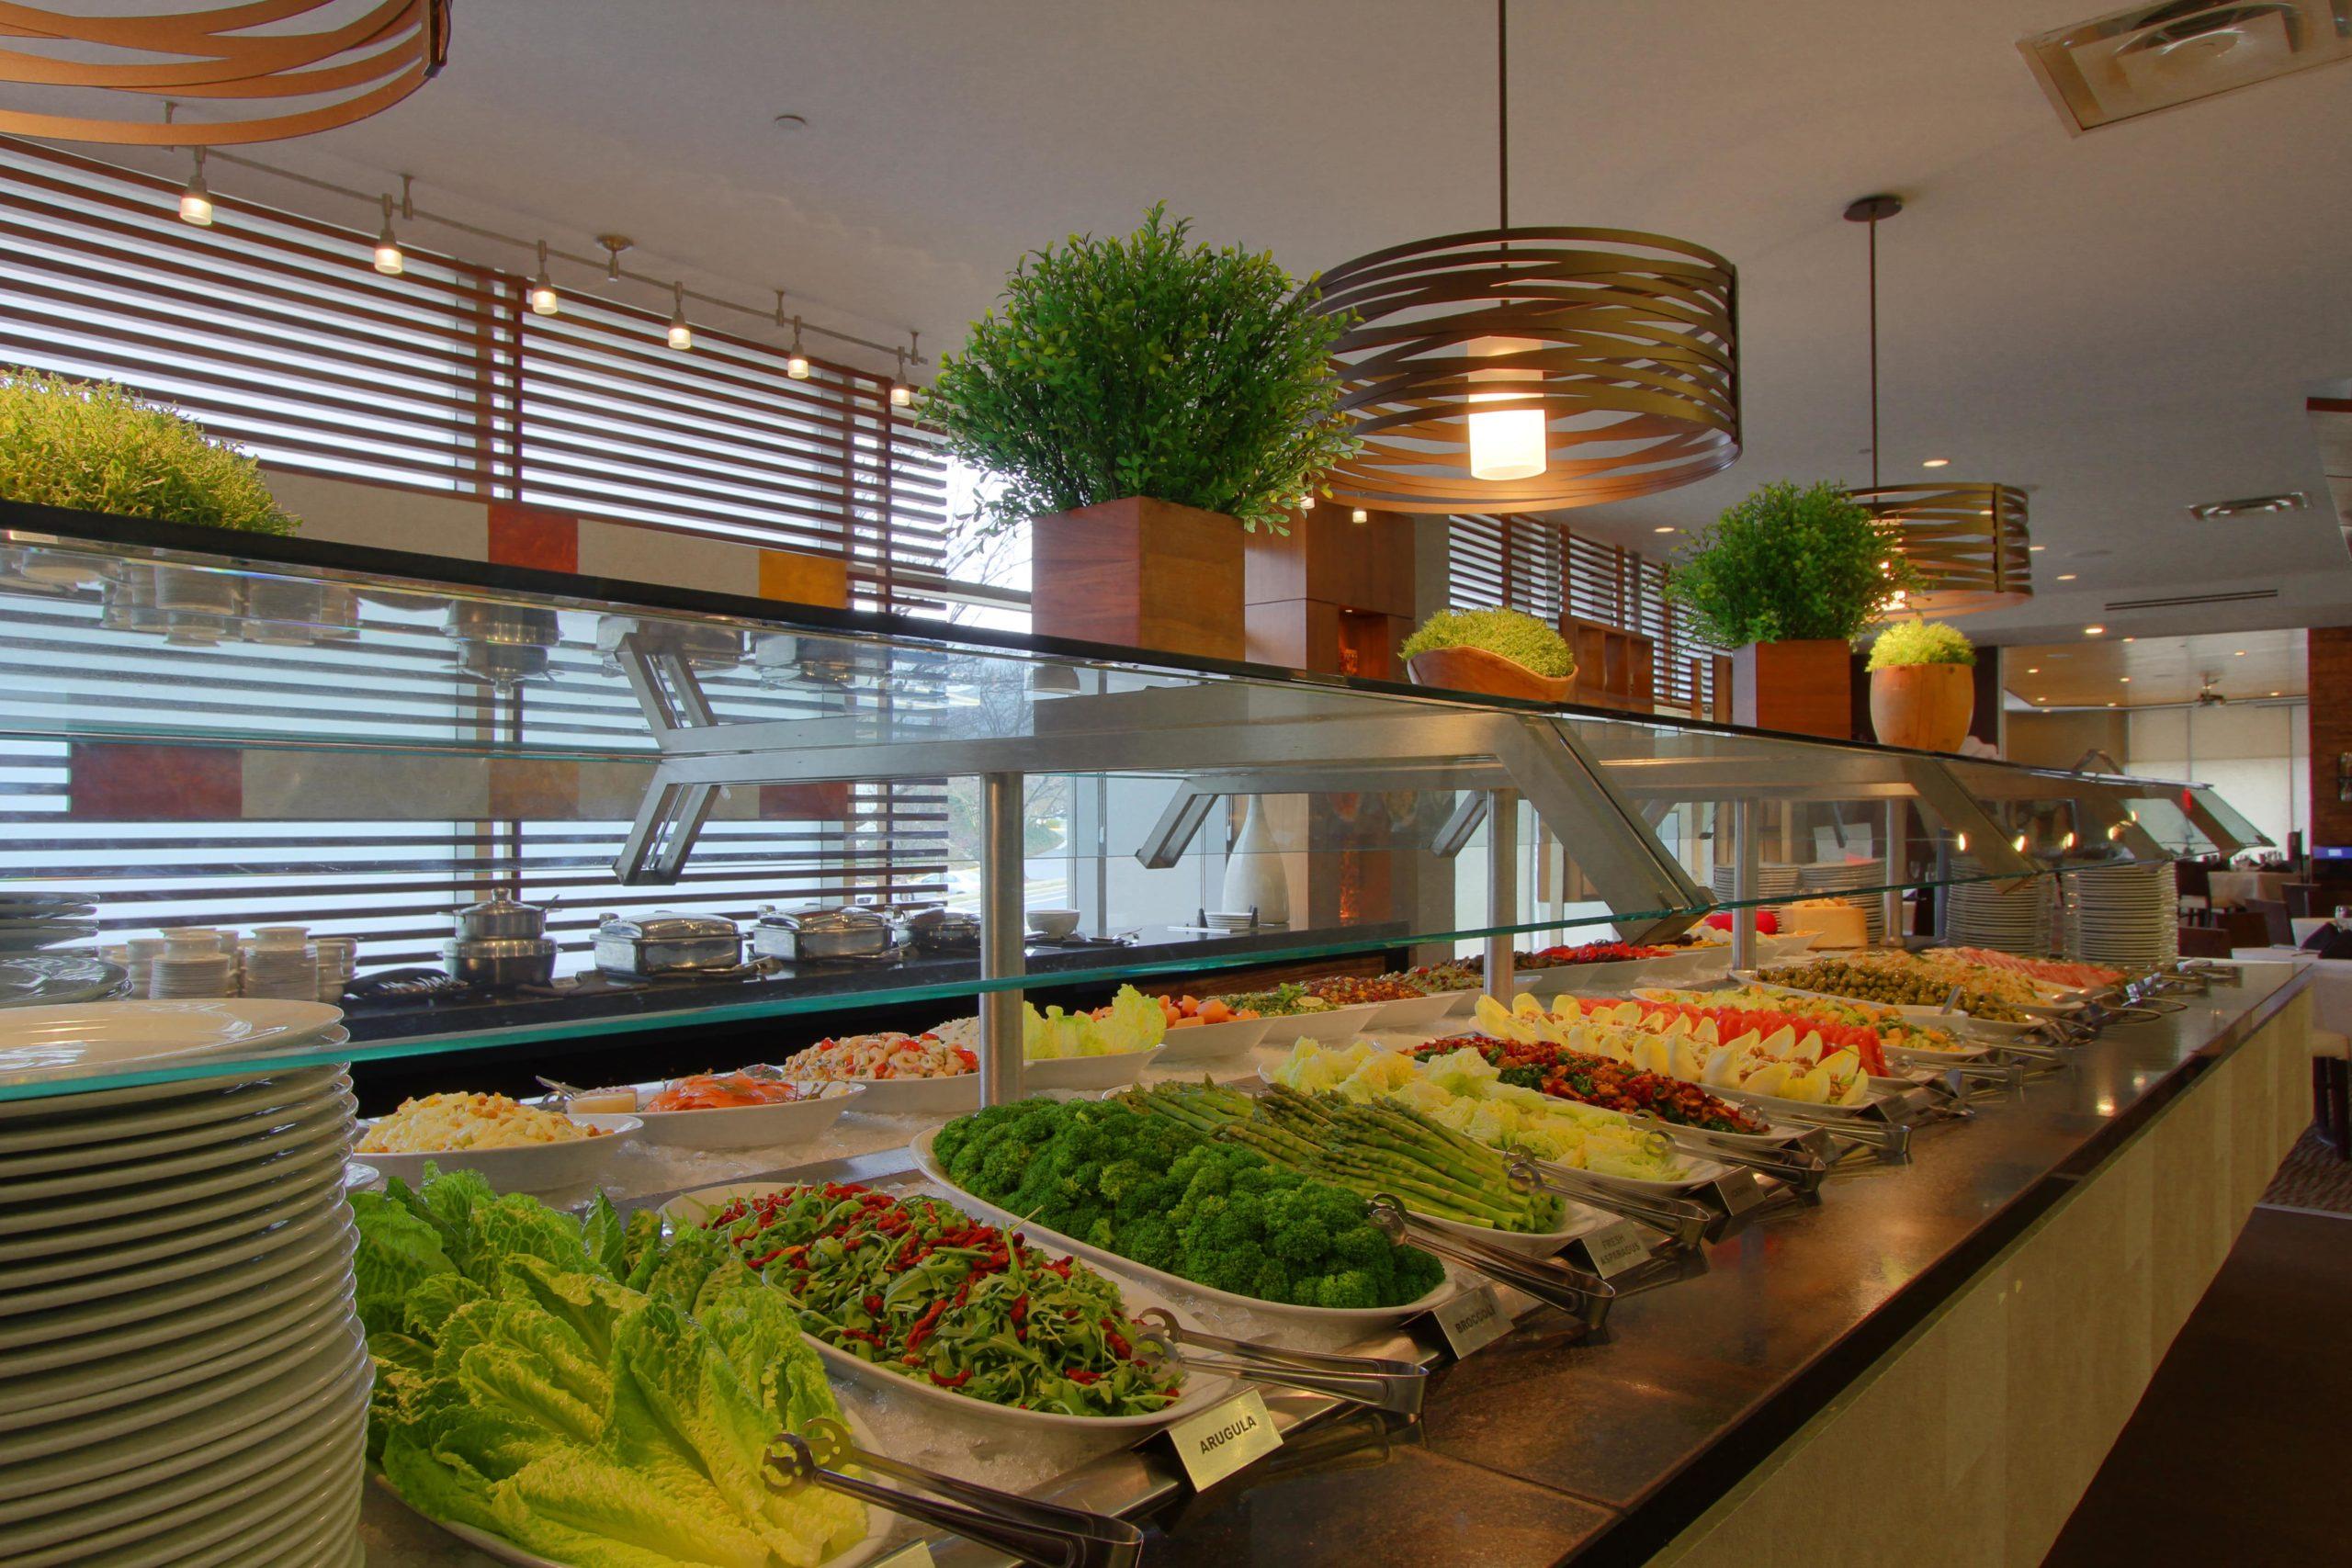 TYS_Salad bar detail 2